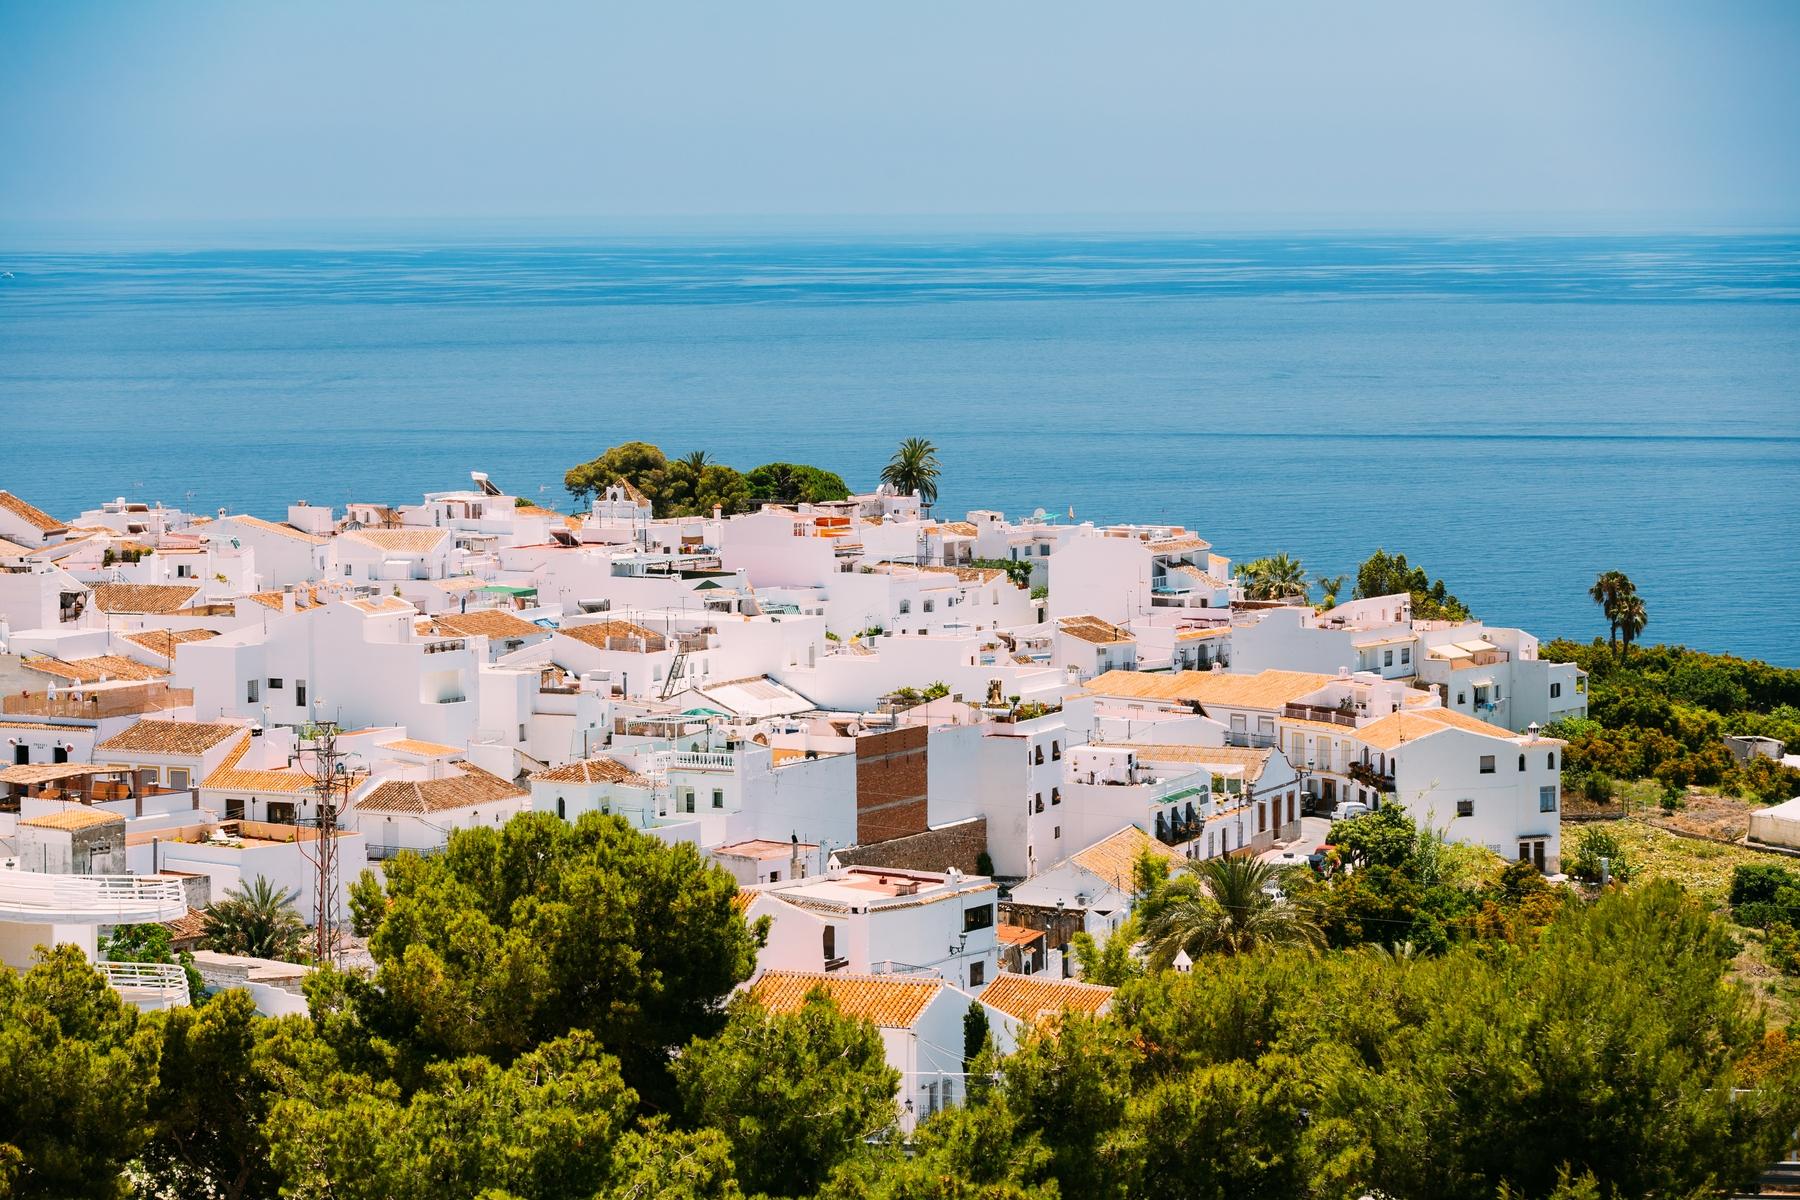 Malaga is perfect for cheap beach holidays